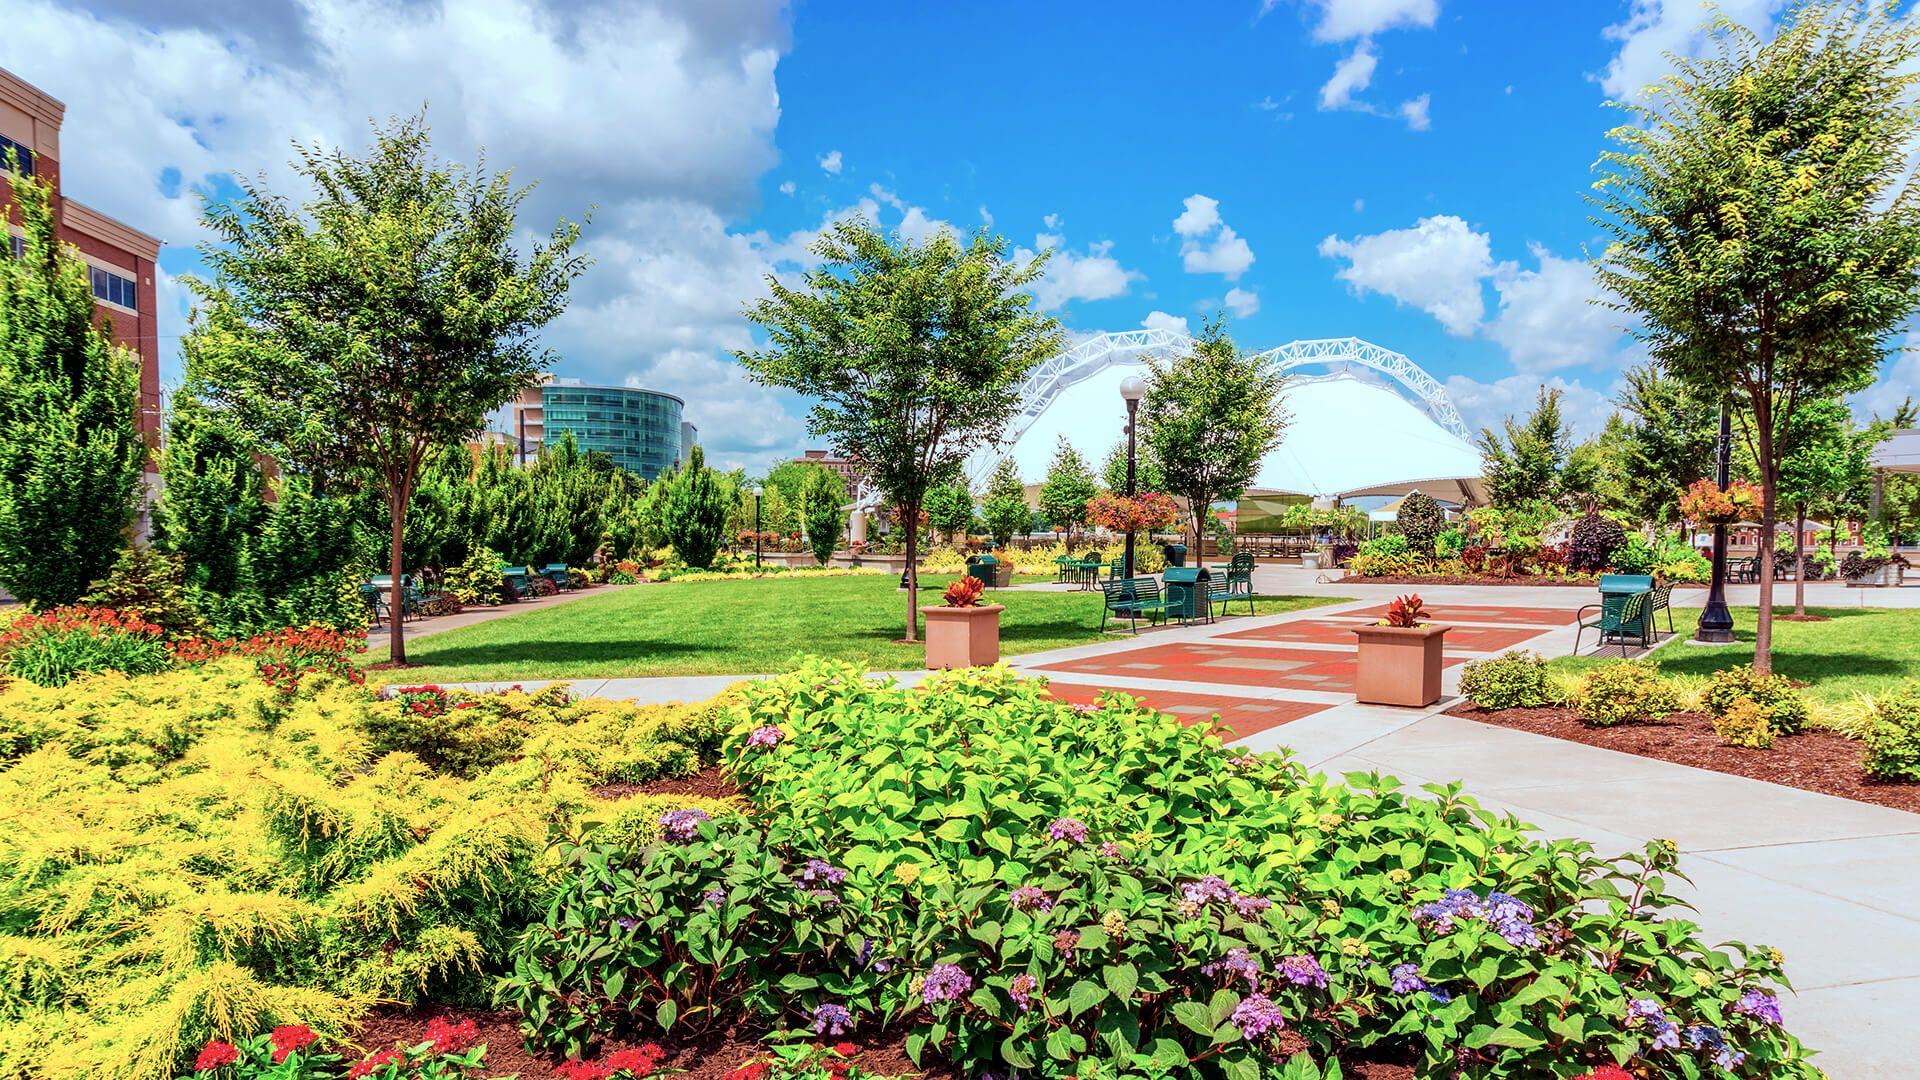 Dayton, Ohio brick path in park, Five Rivers Metropark, Metropark, flower planters in park.